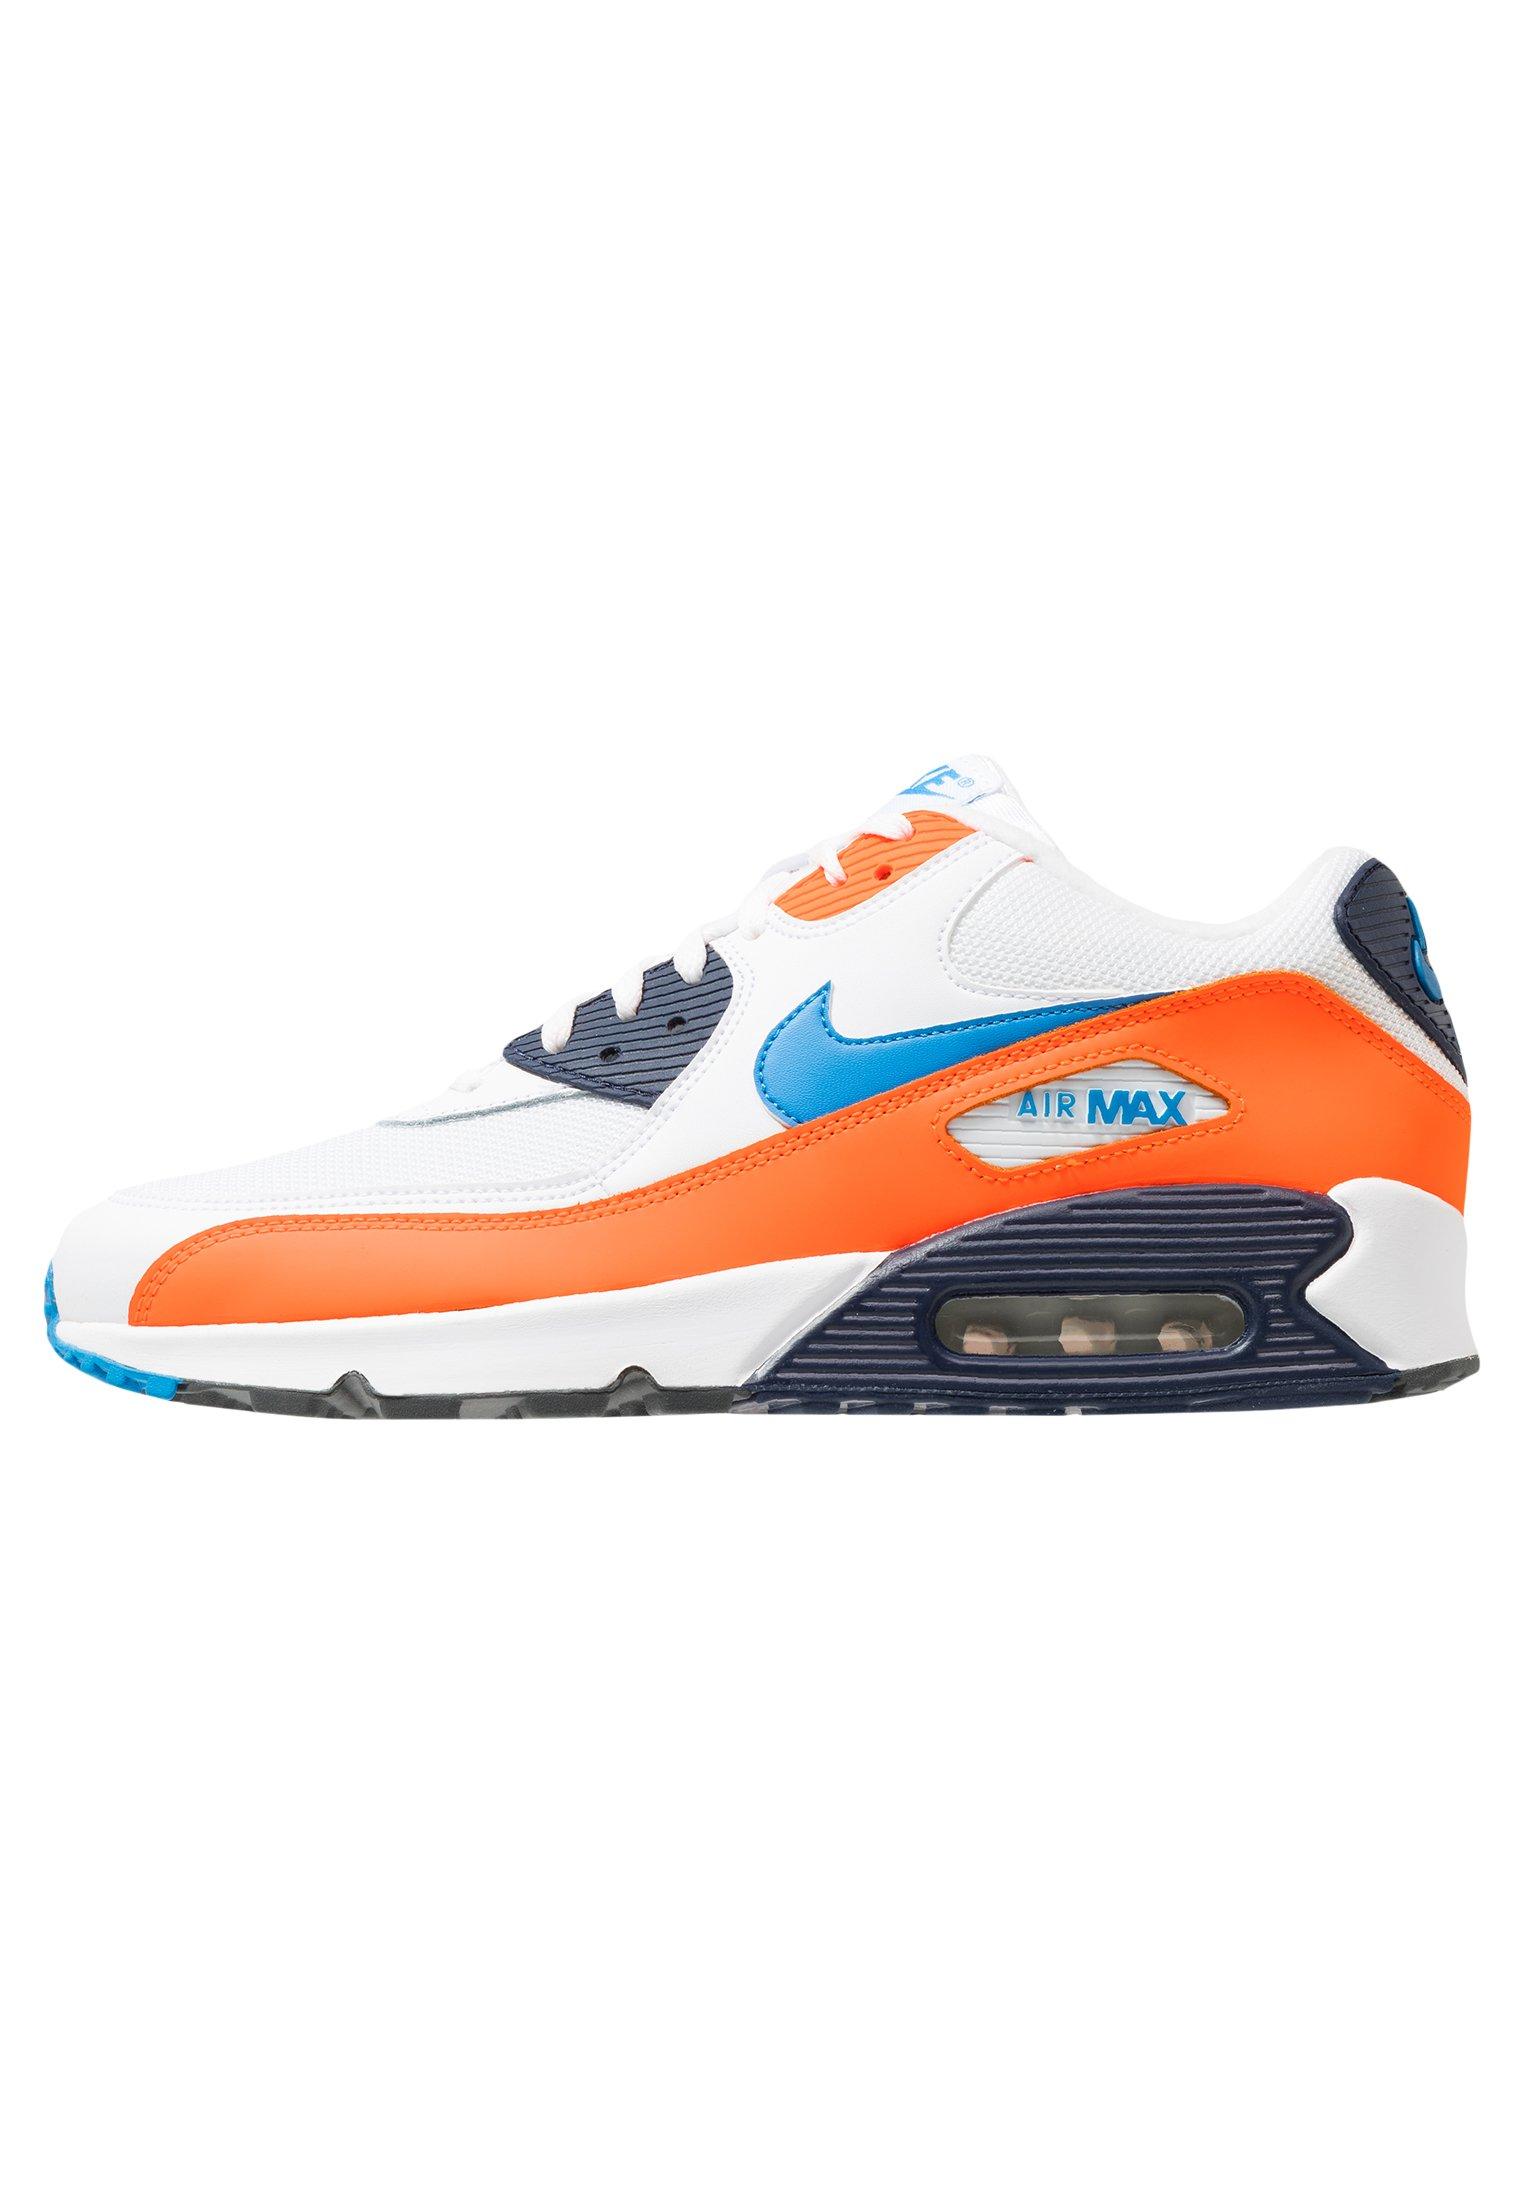 AIR MAX 90 ESSENTIAL Sneakers basse whitephoto bluetotal orangemidnight navydark grey